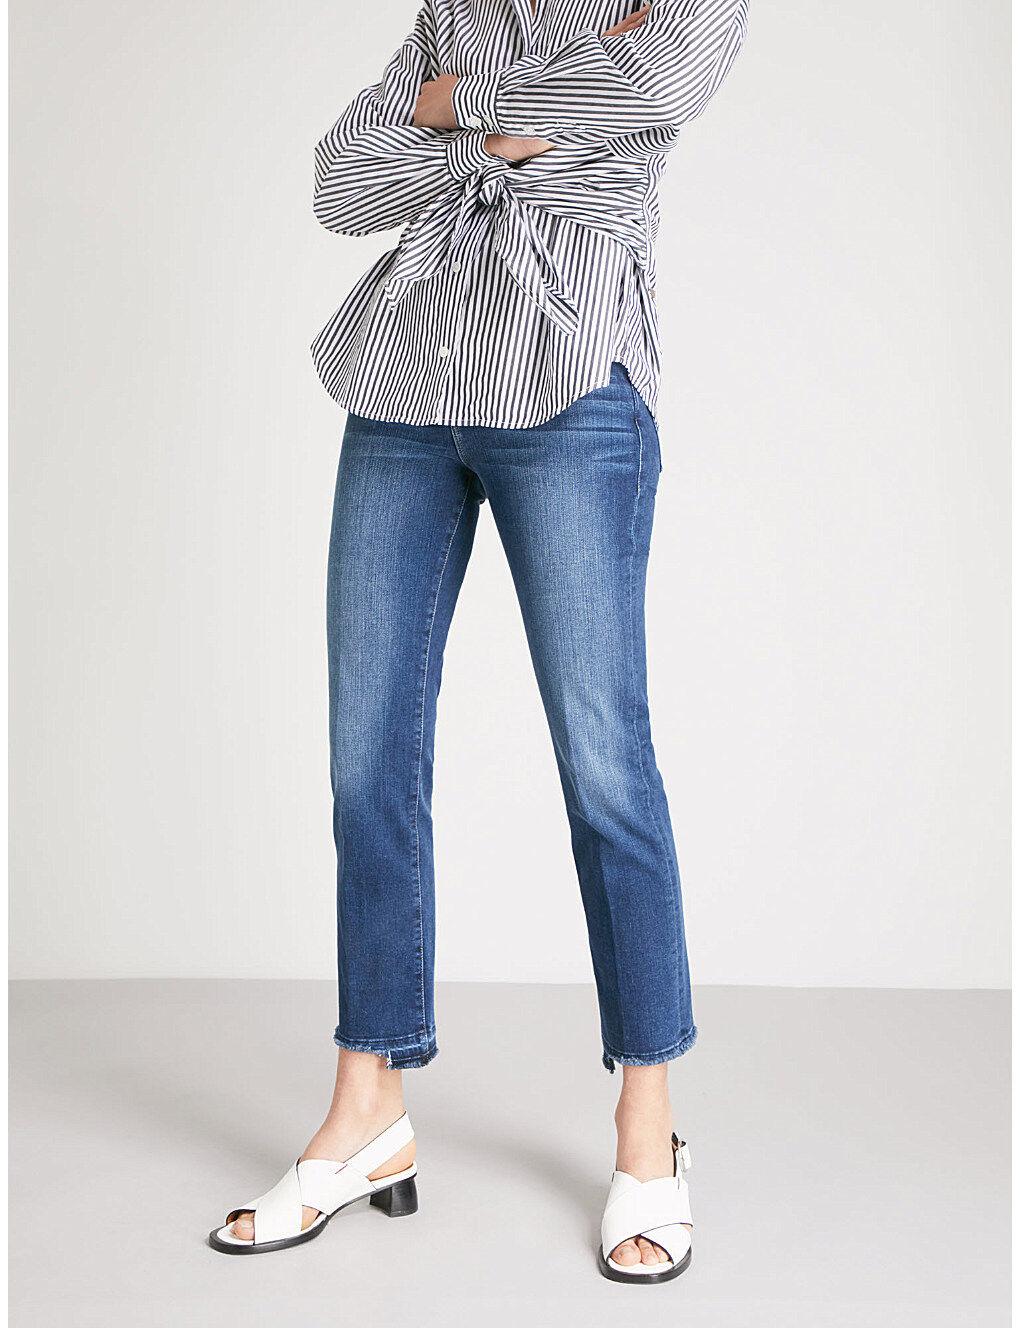 NWT Frame Denim Le High released-hem straight high-rise jeans FORTUNA SZ 27